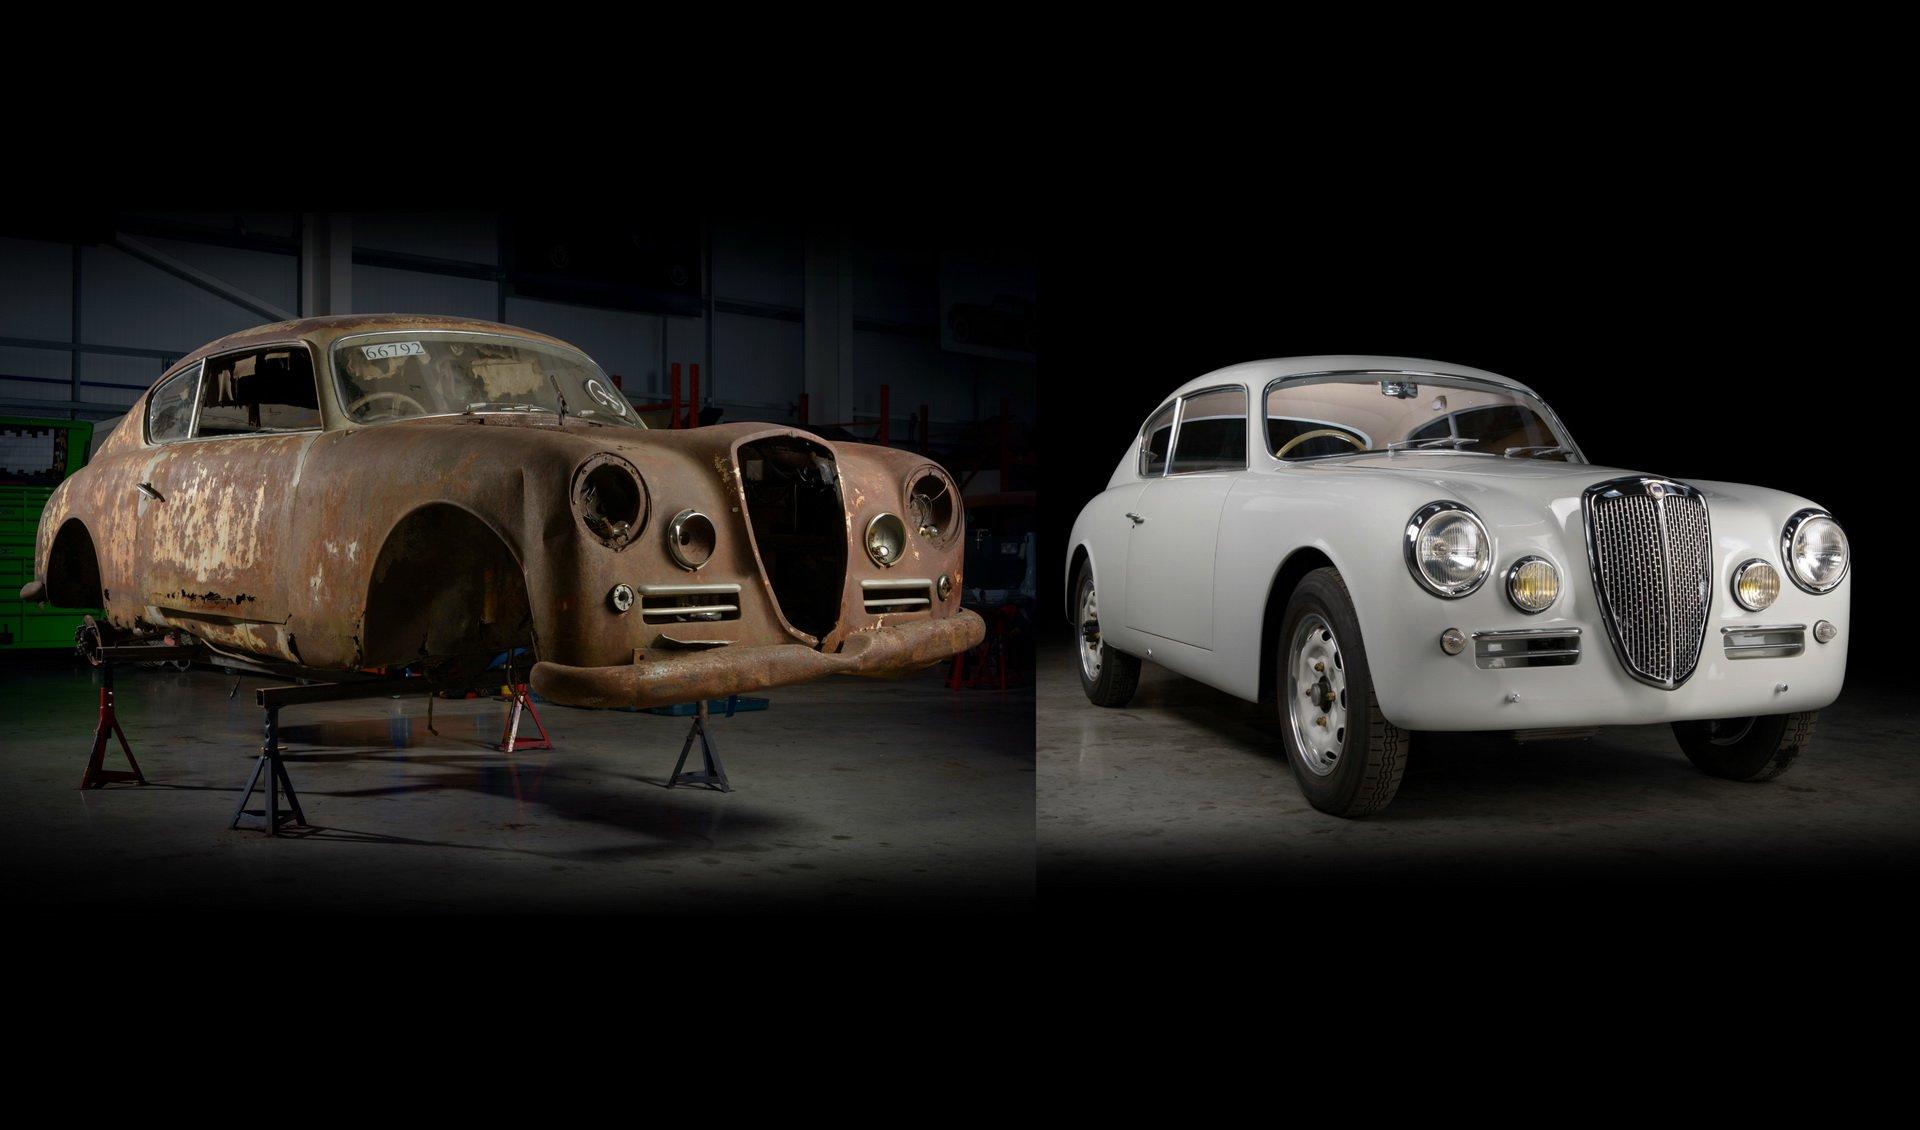 Lancia-Aurelia-B20-GT-restored-1